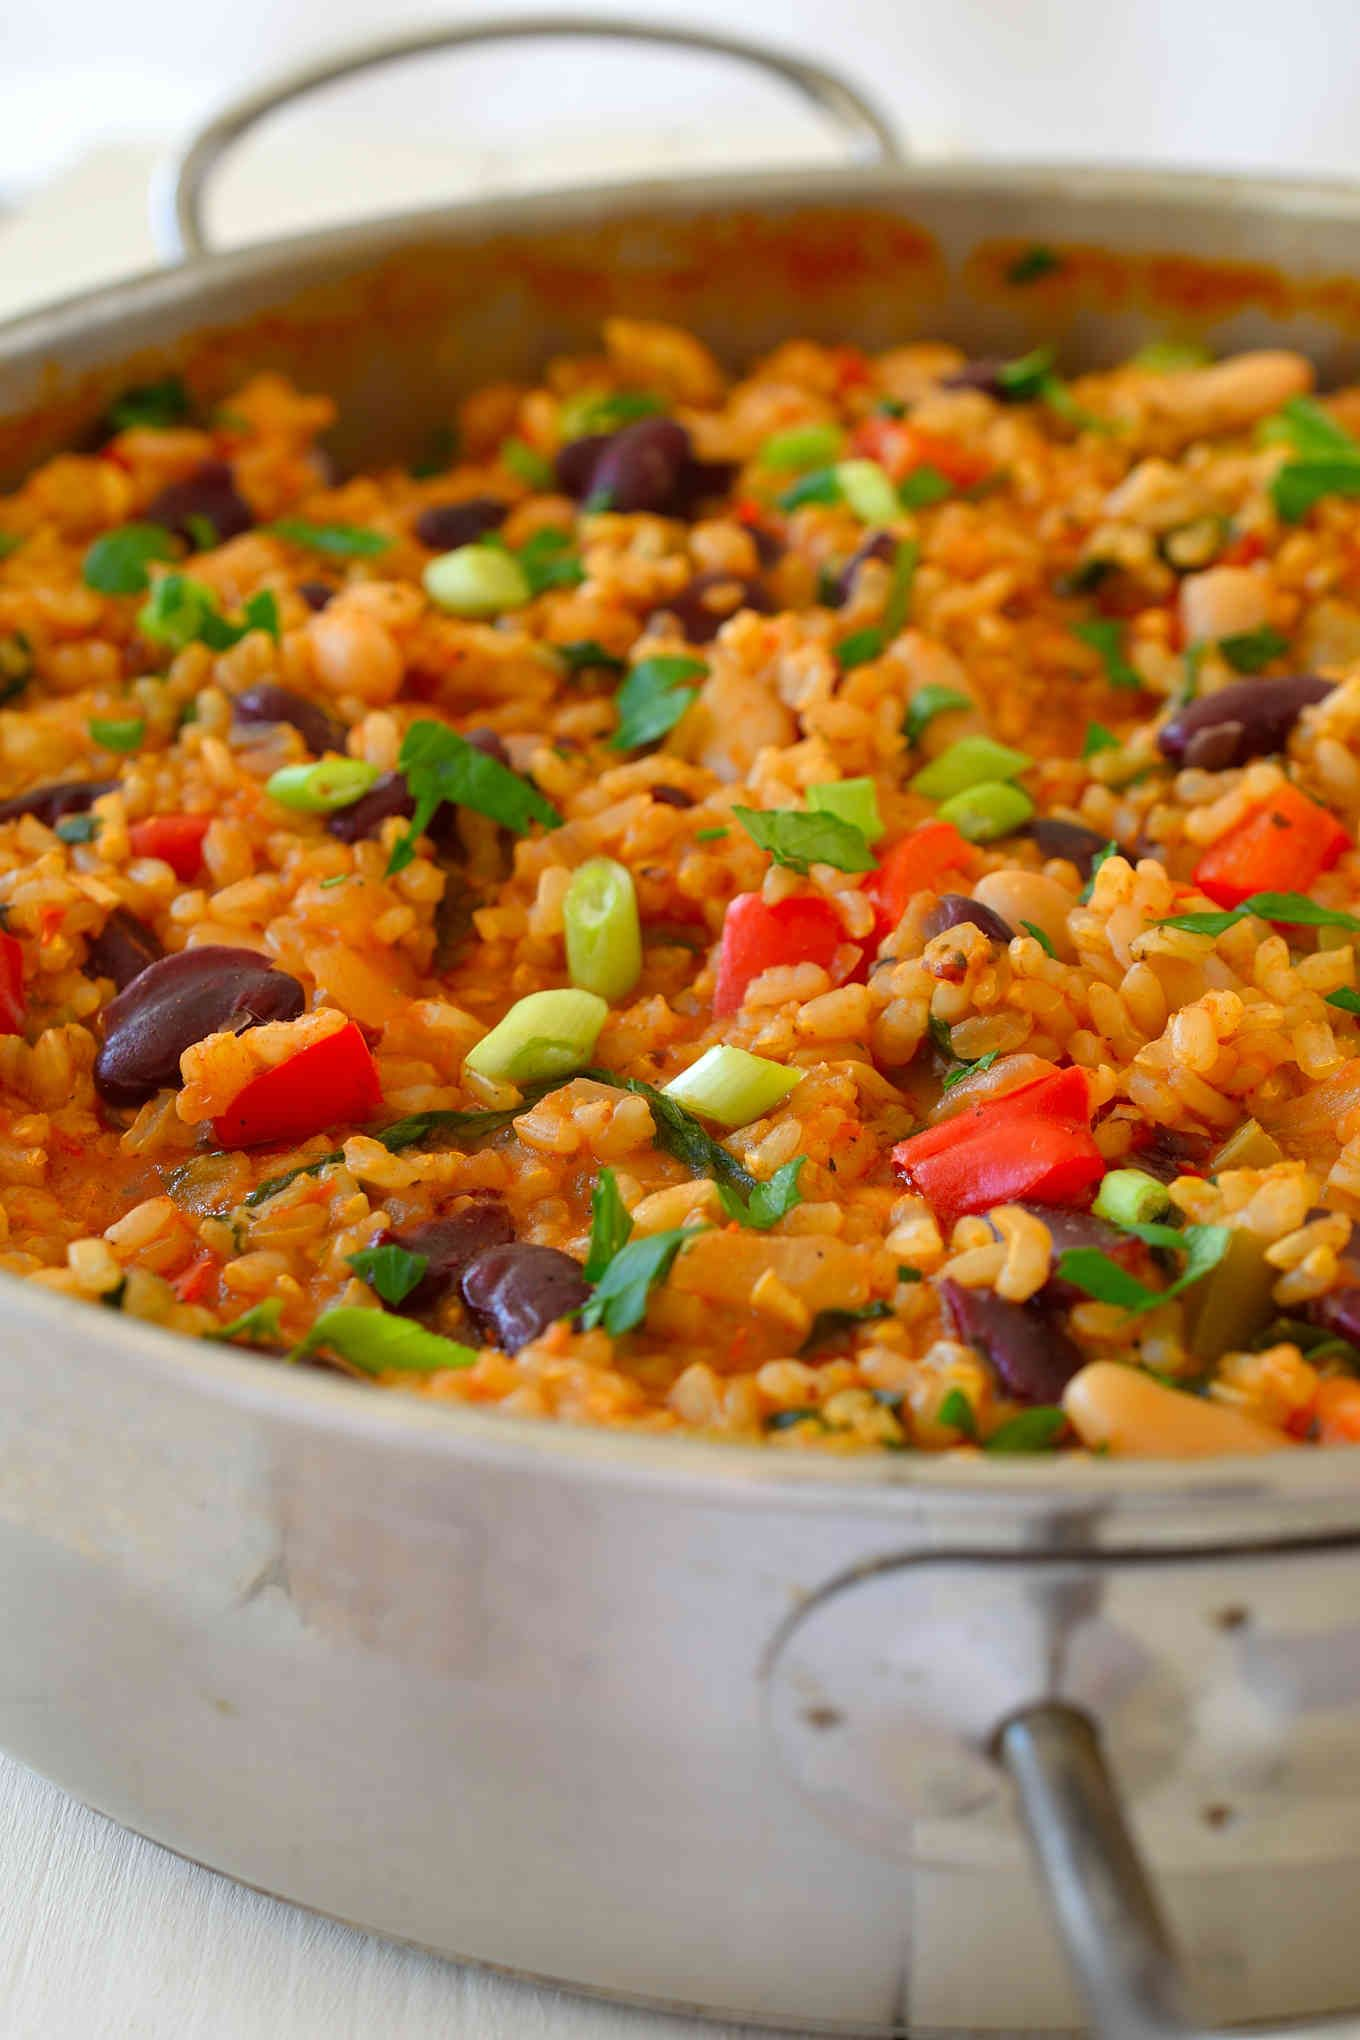 Vegan Jambalaya Recipe Vegan Jambalaya Vegan Dinner Recipes Vegan Dishes